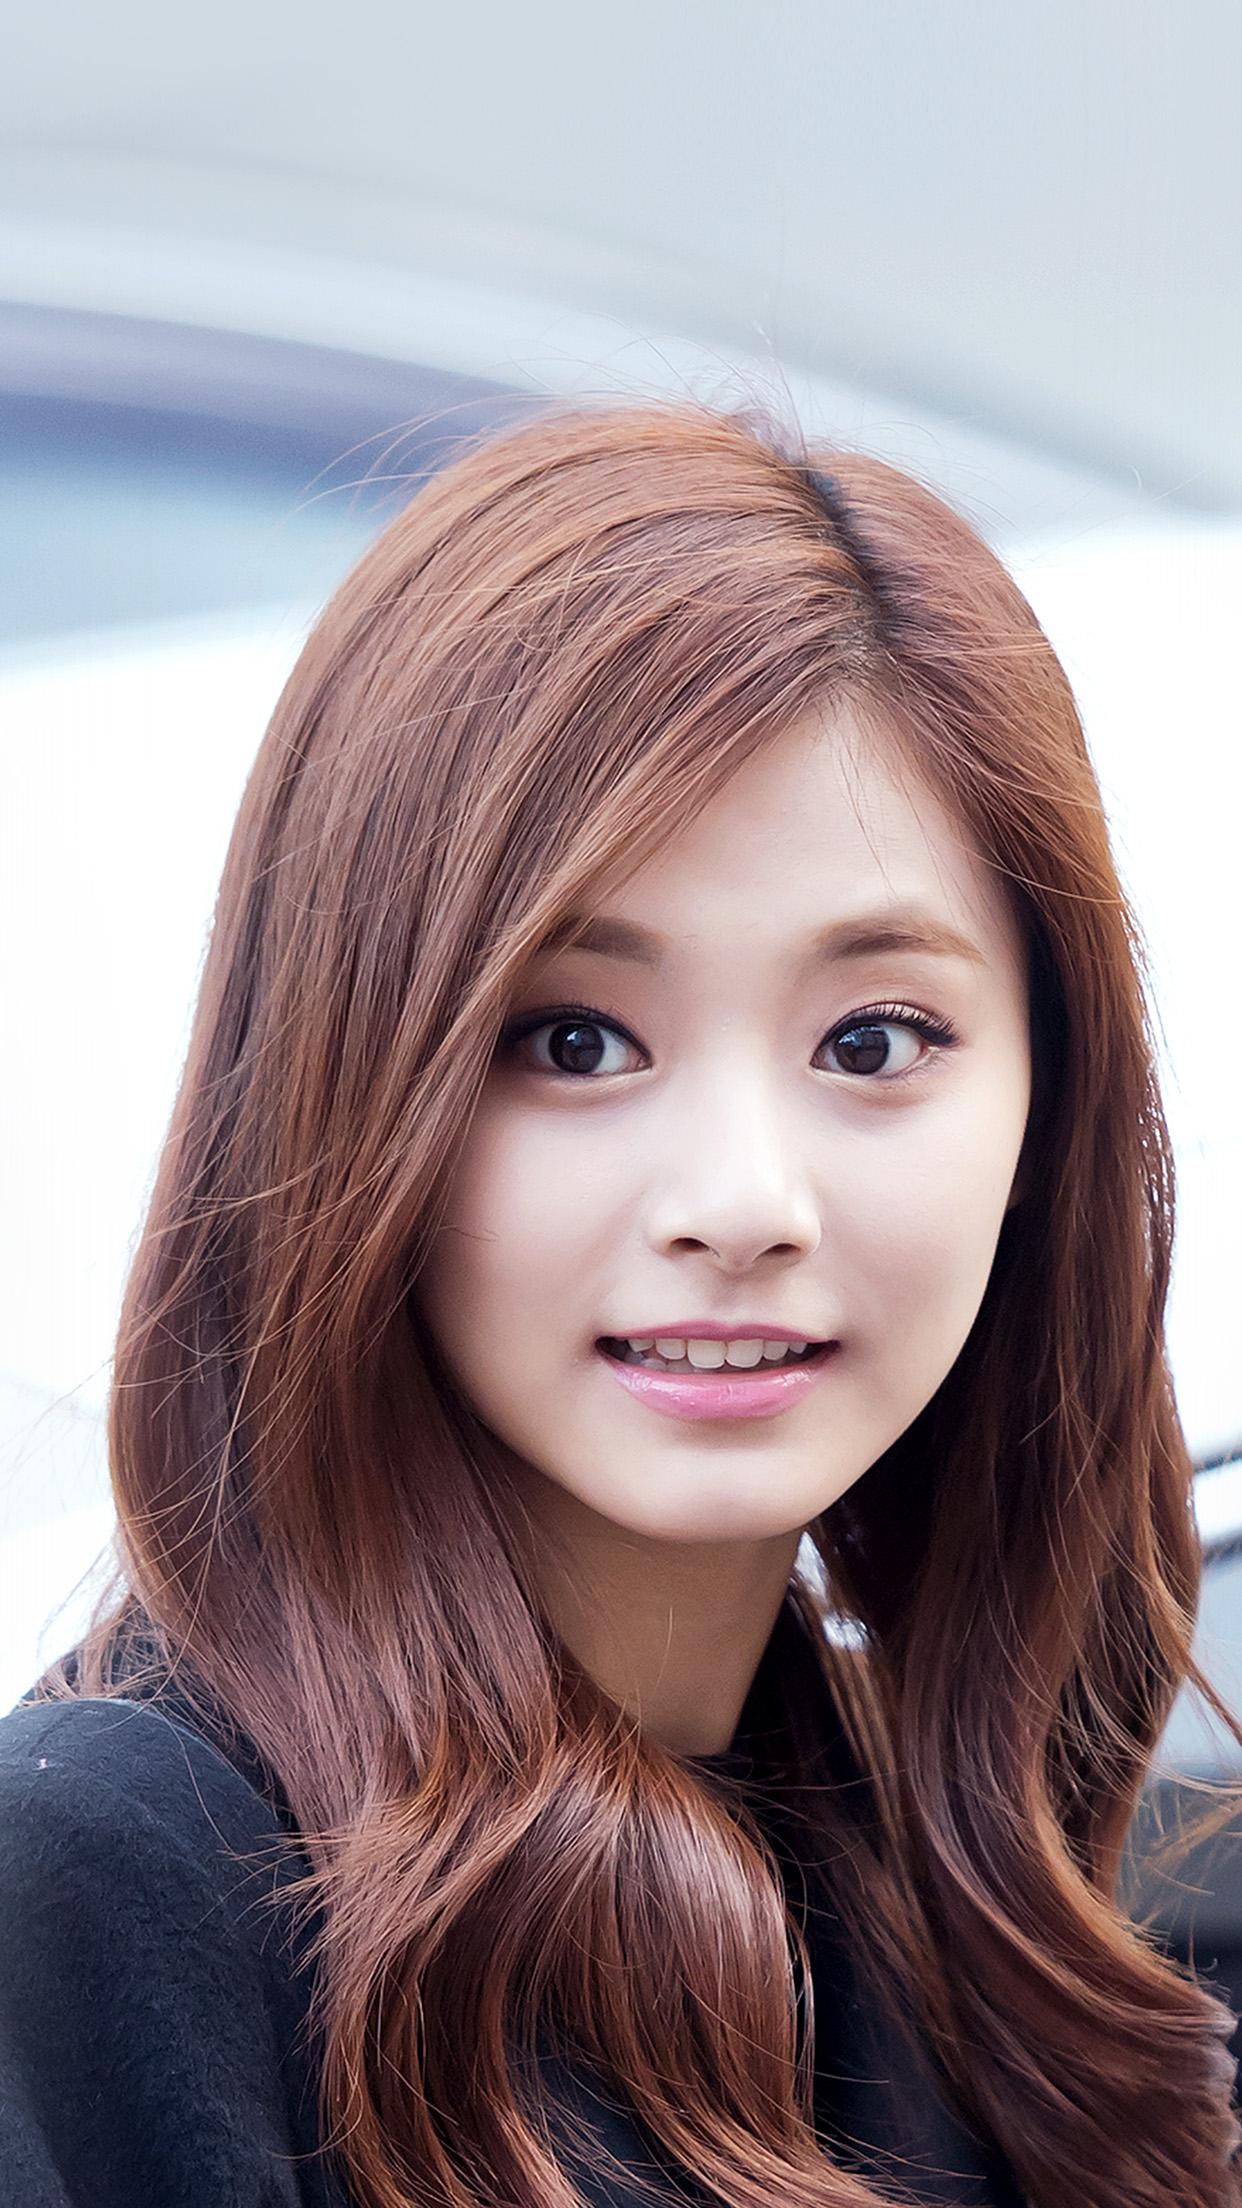 I Love Papers Hh32 Tzuyu Twice Smile Cute Kpop Jyp